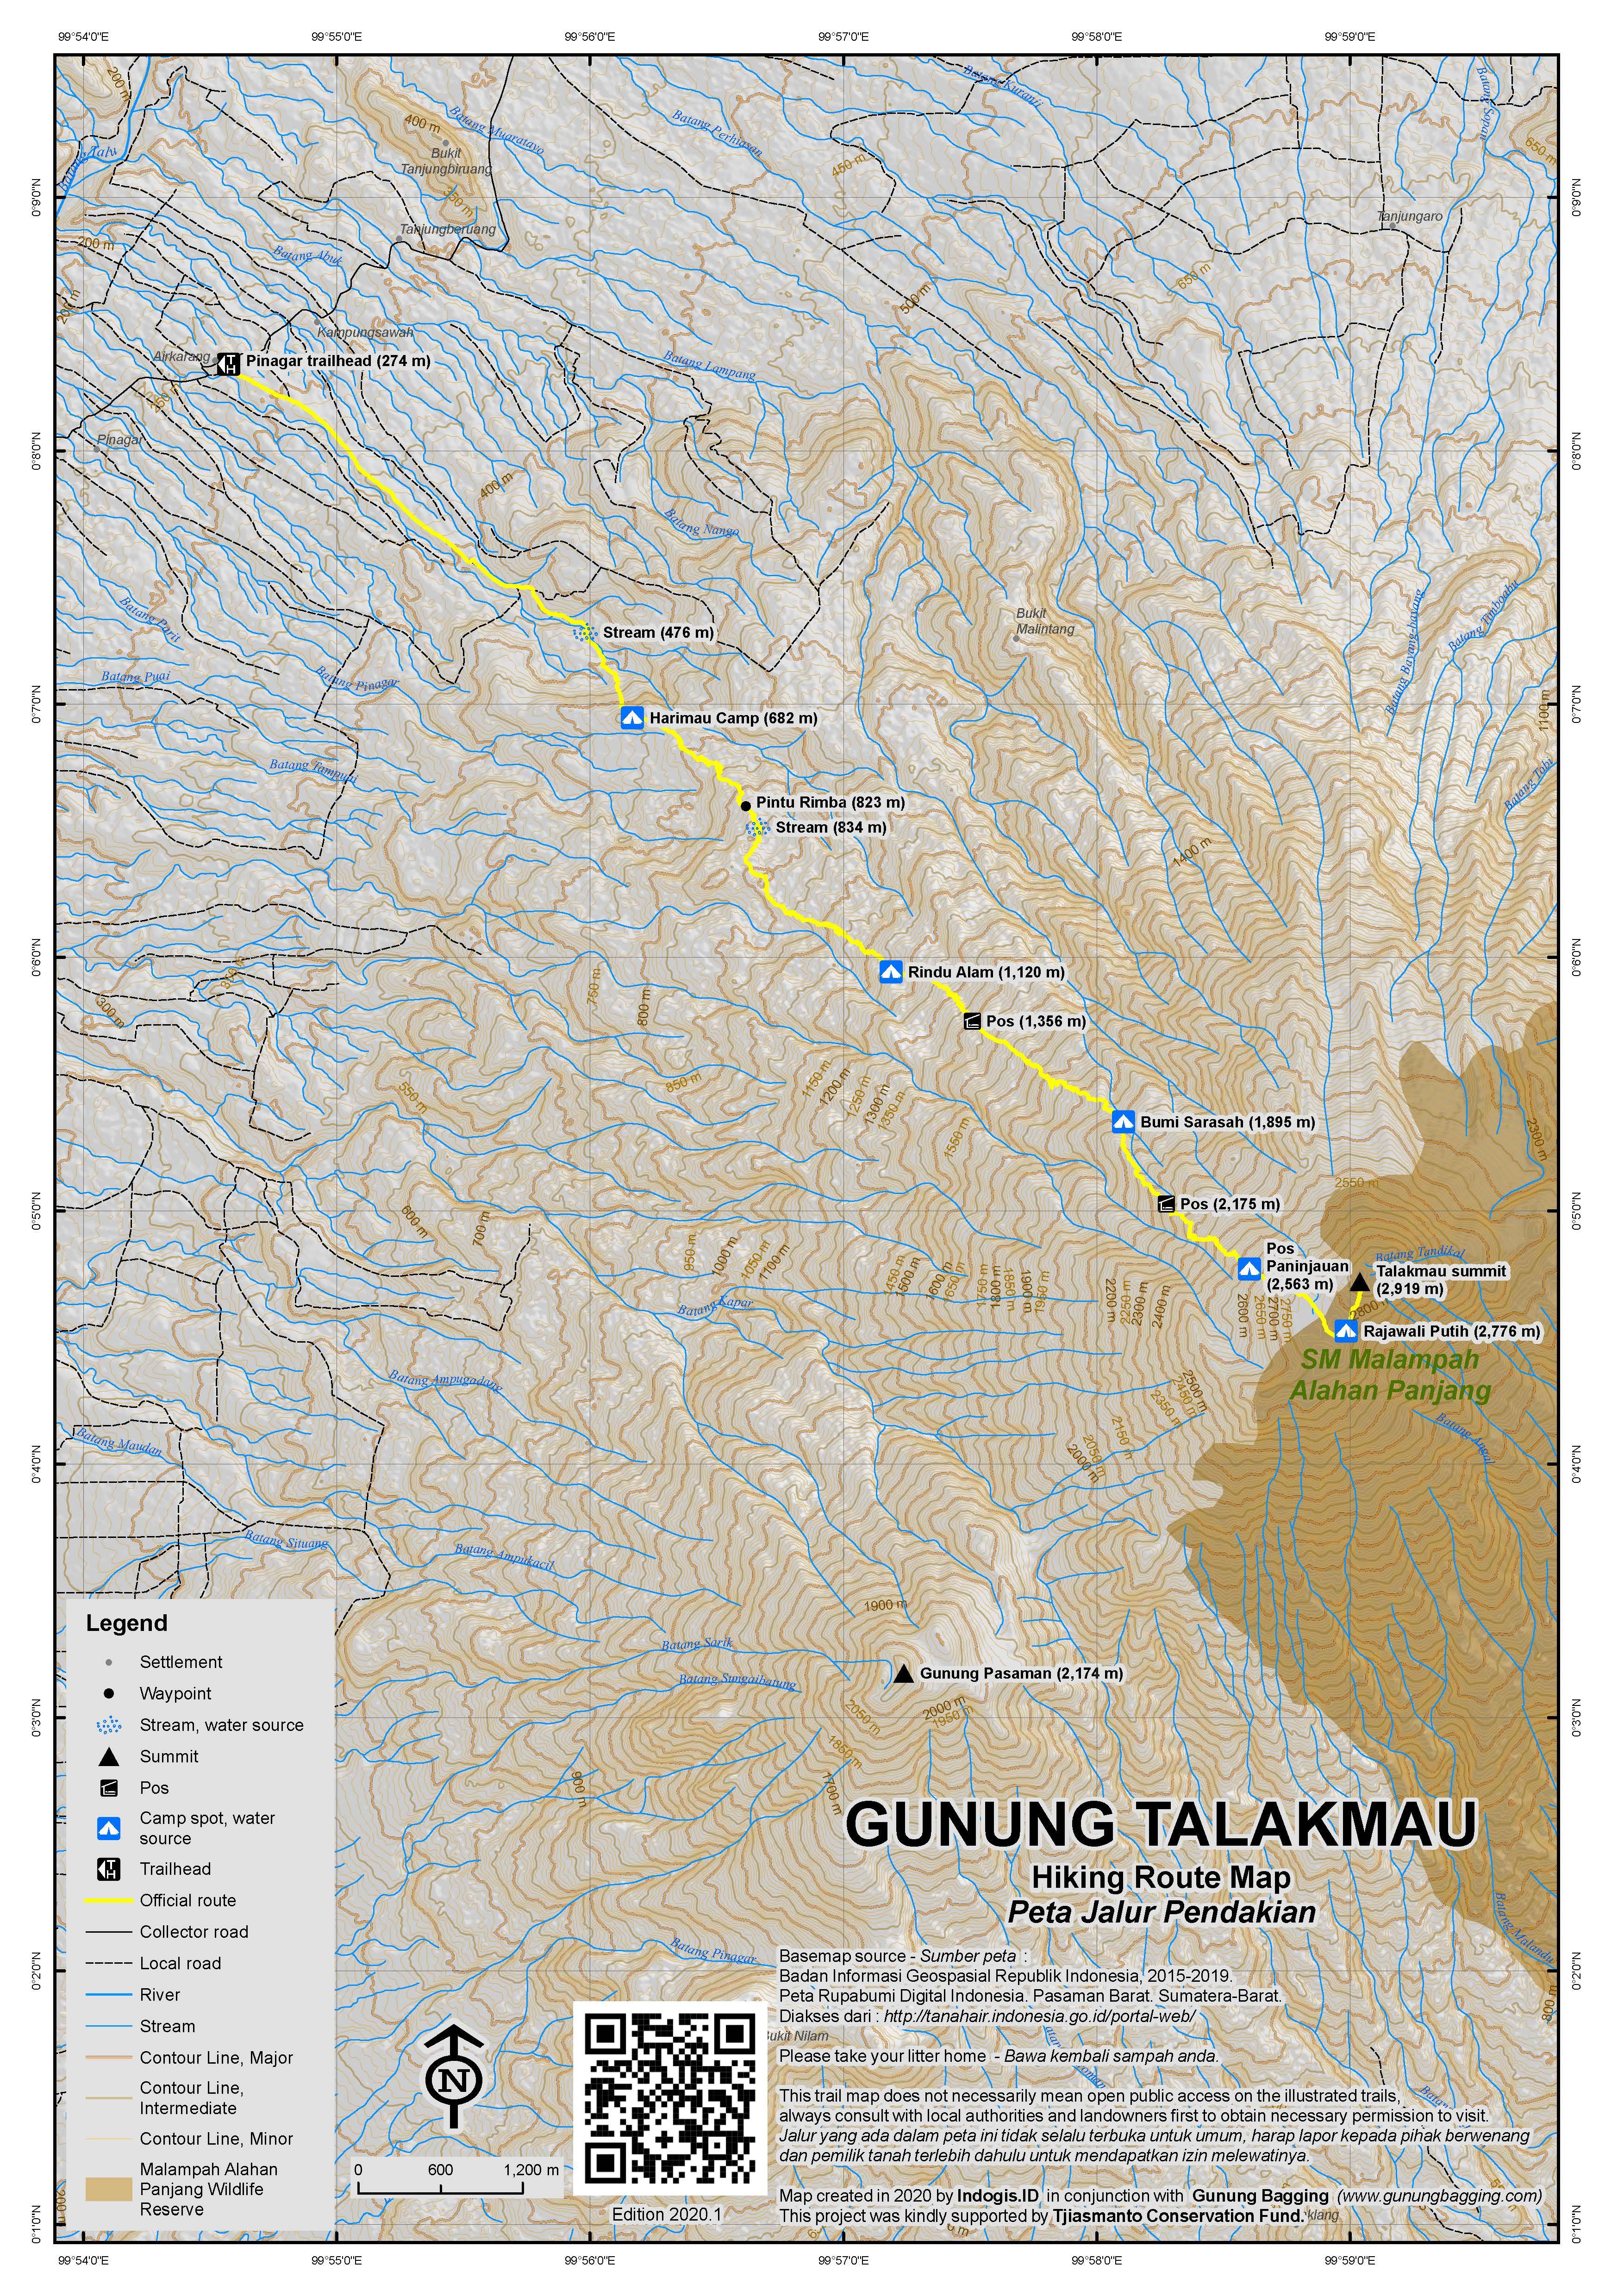 Peta Jalur Pendakian Gunung Talakmau